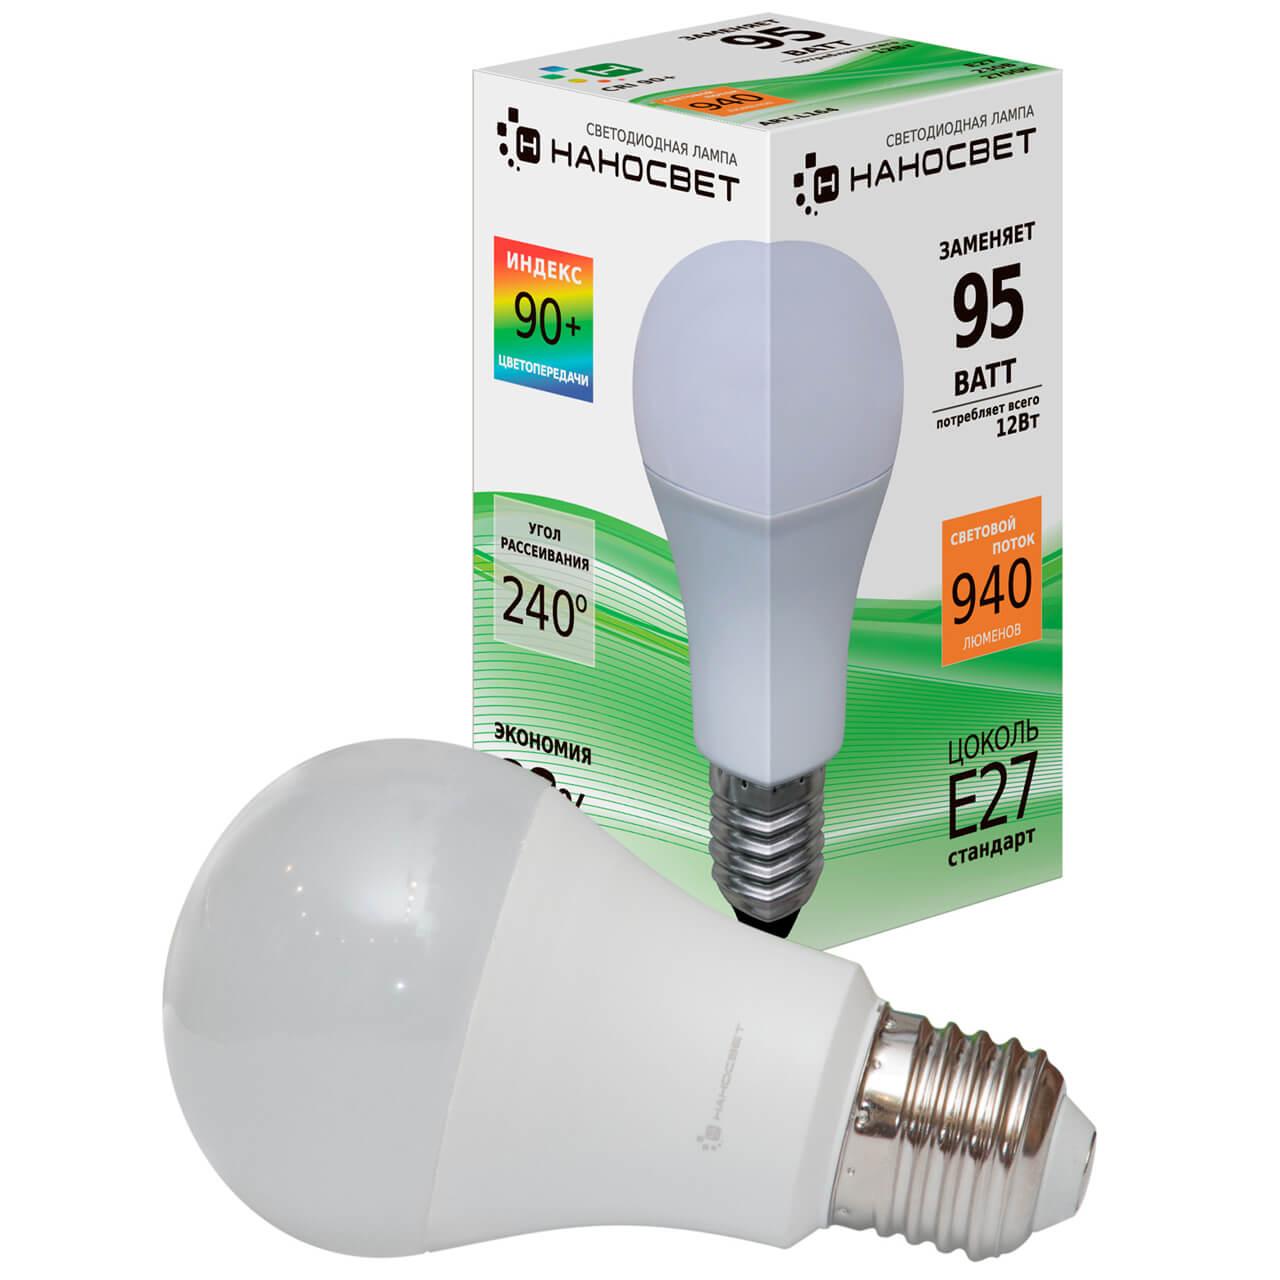 Лампа светодиодная Наносвет E27 12W 2700K матовая LE-GLS-12/E27/827 L164 лампа светодиодная e27 6w 2700k свеча матовая le cd 6 e27 827 l252